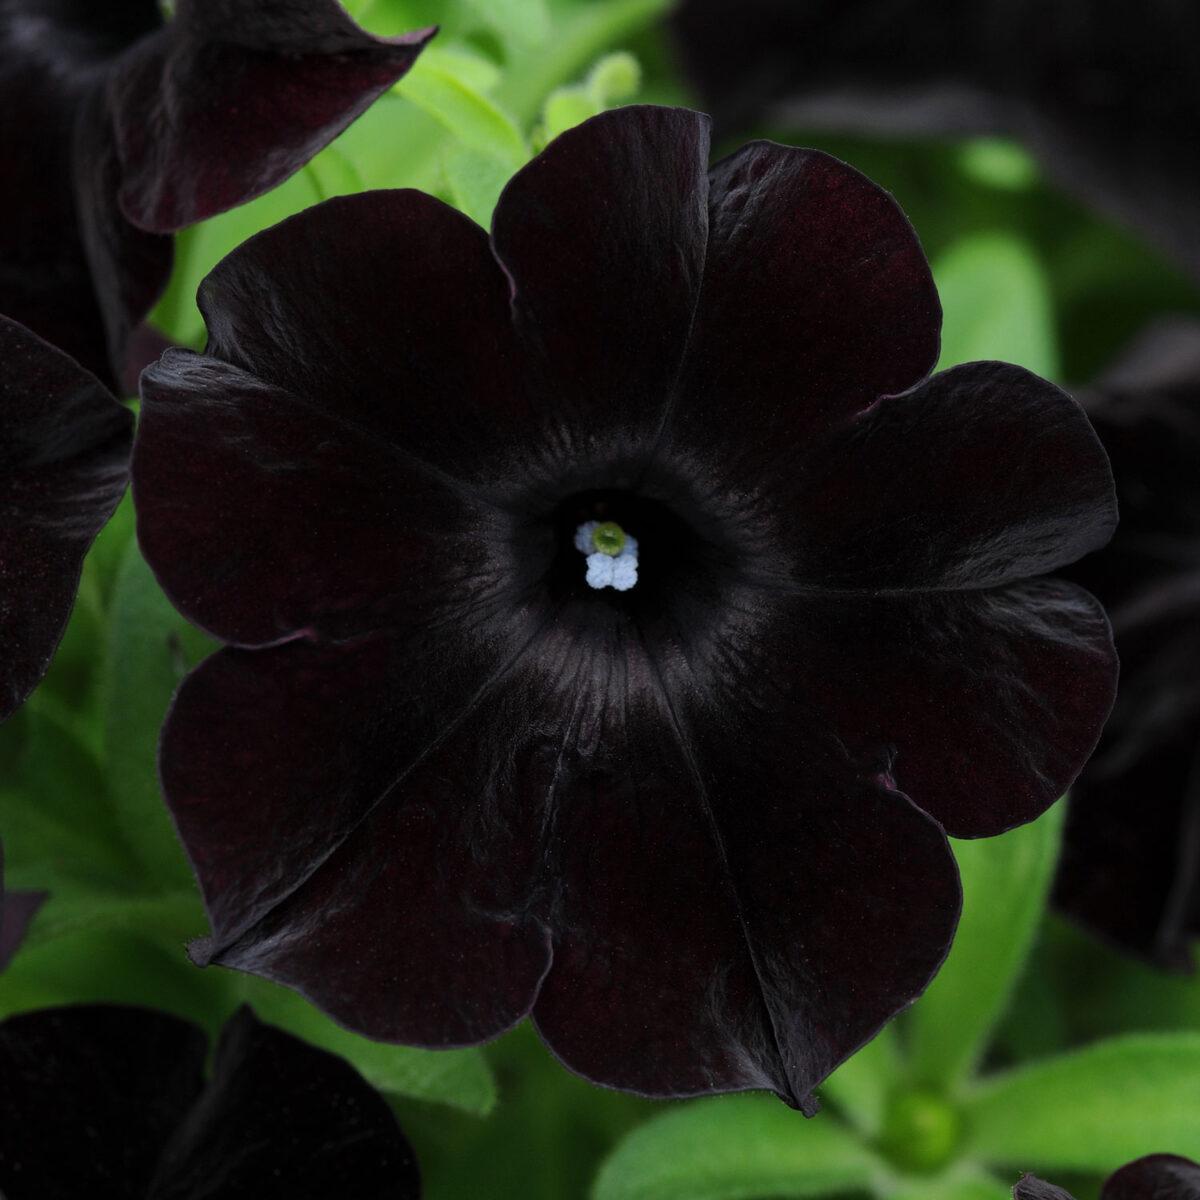 piante-fiori-neri-giardino-blackmagic